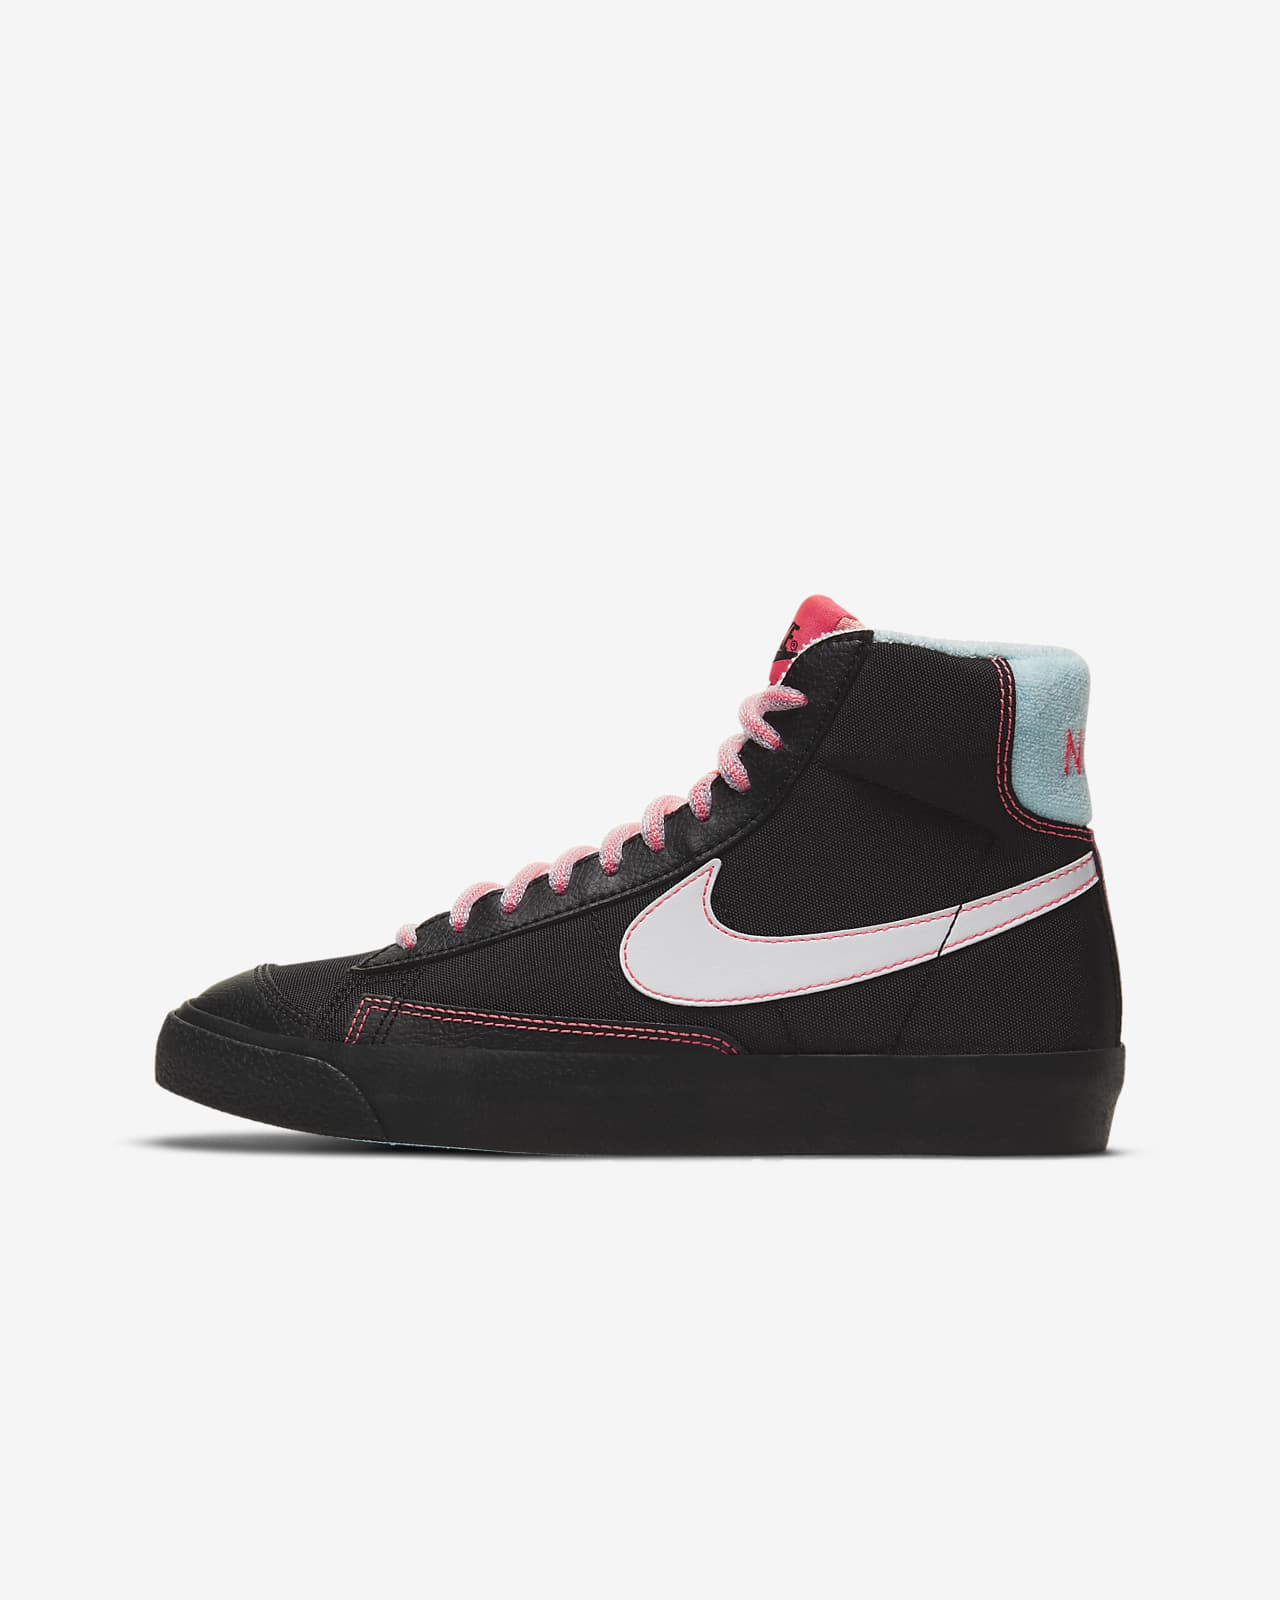 Chaussure Nike Blazer Mid '77 pour Enfant plus âgé. Nike LU